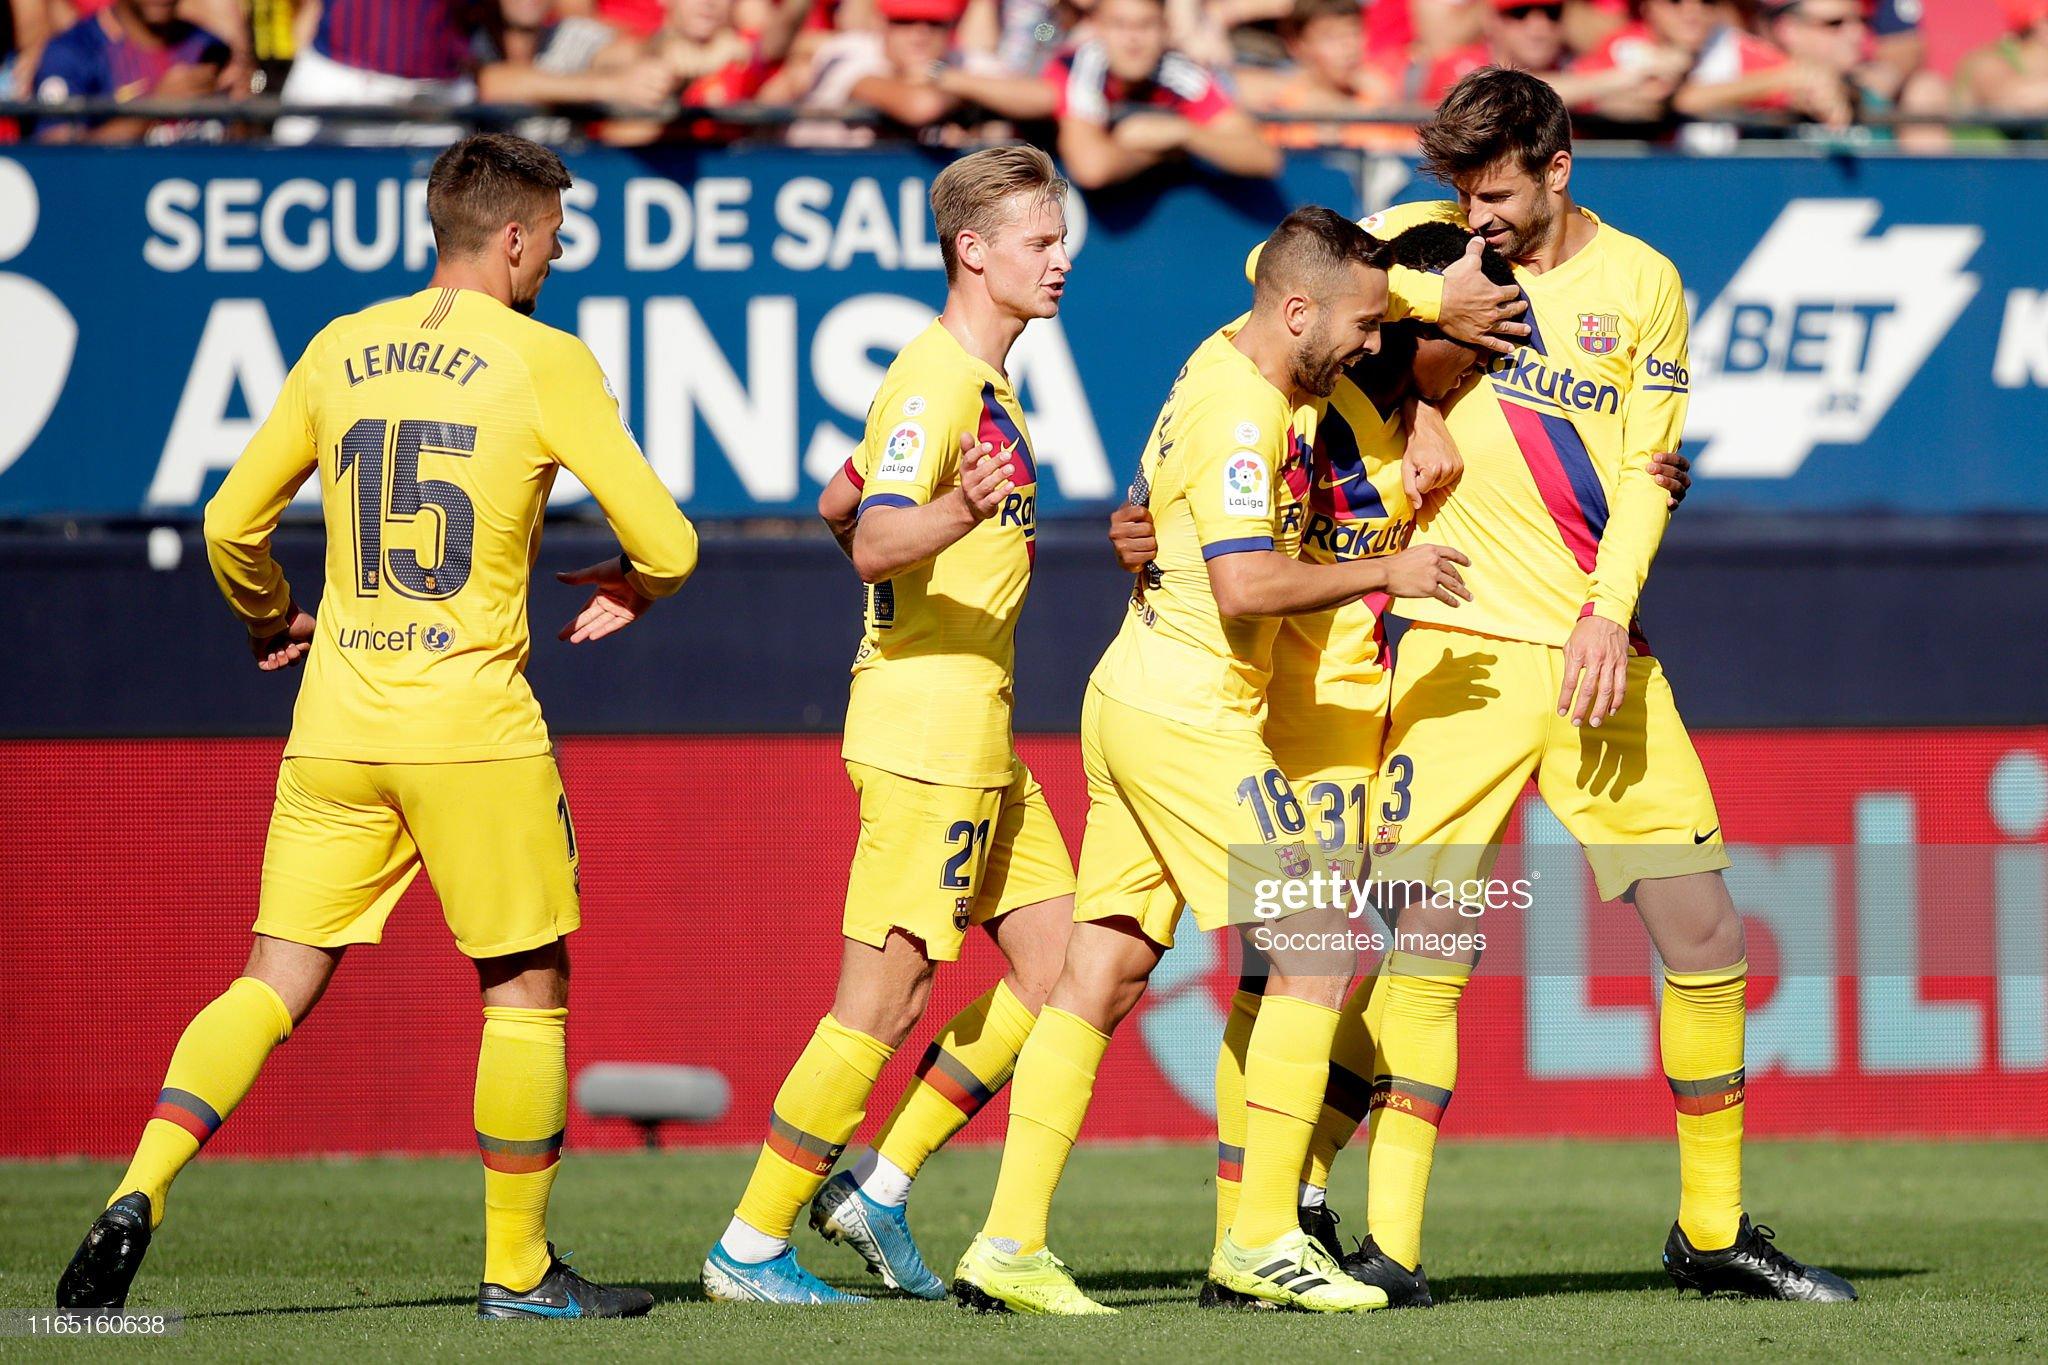 صور مباراة : أوساسونا - برشلونة 2-2 ( 31-08-2019 )  Ansu-fati-of-fc-barcelona-celebrates-with-clement-lenglet-of-fc-de-picture-id1165160638?s=2048x2048